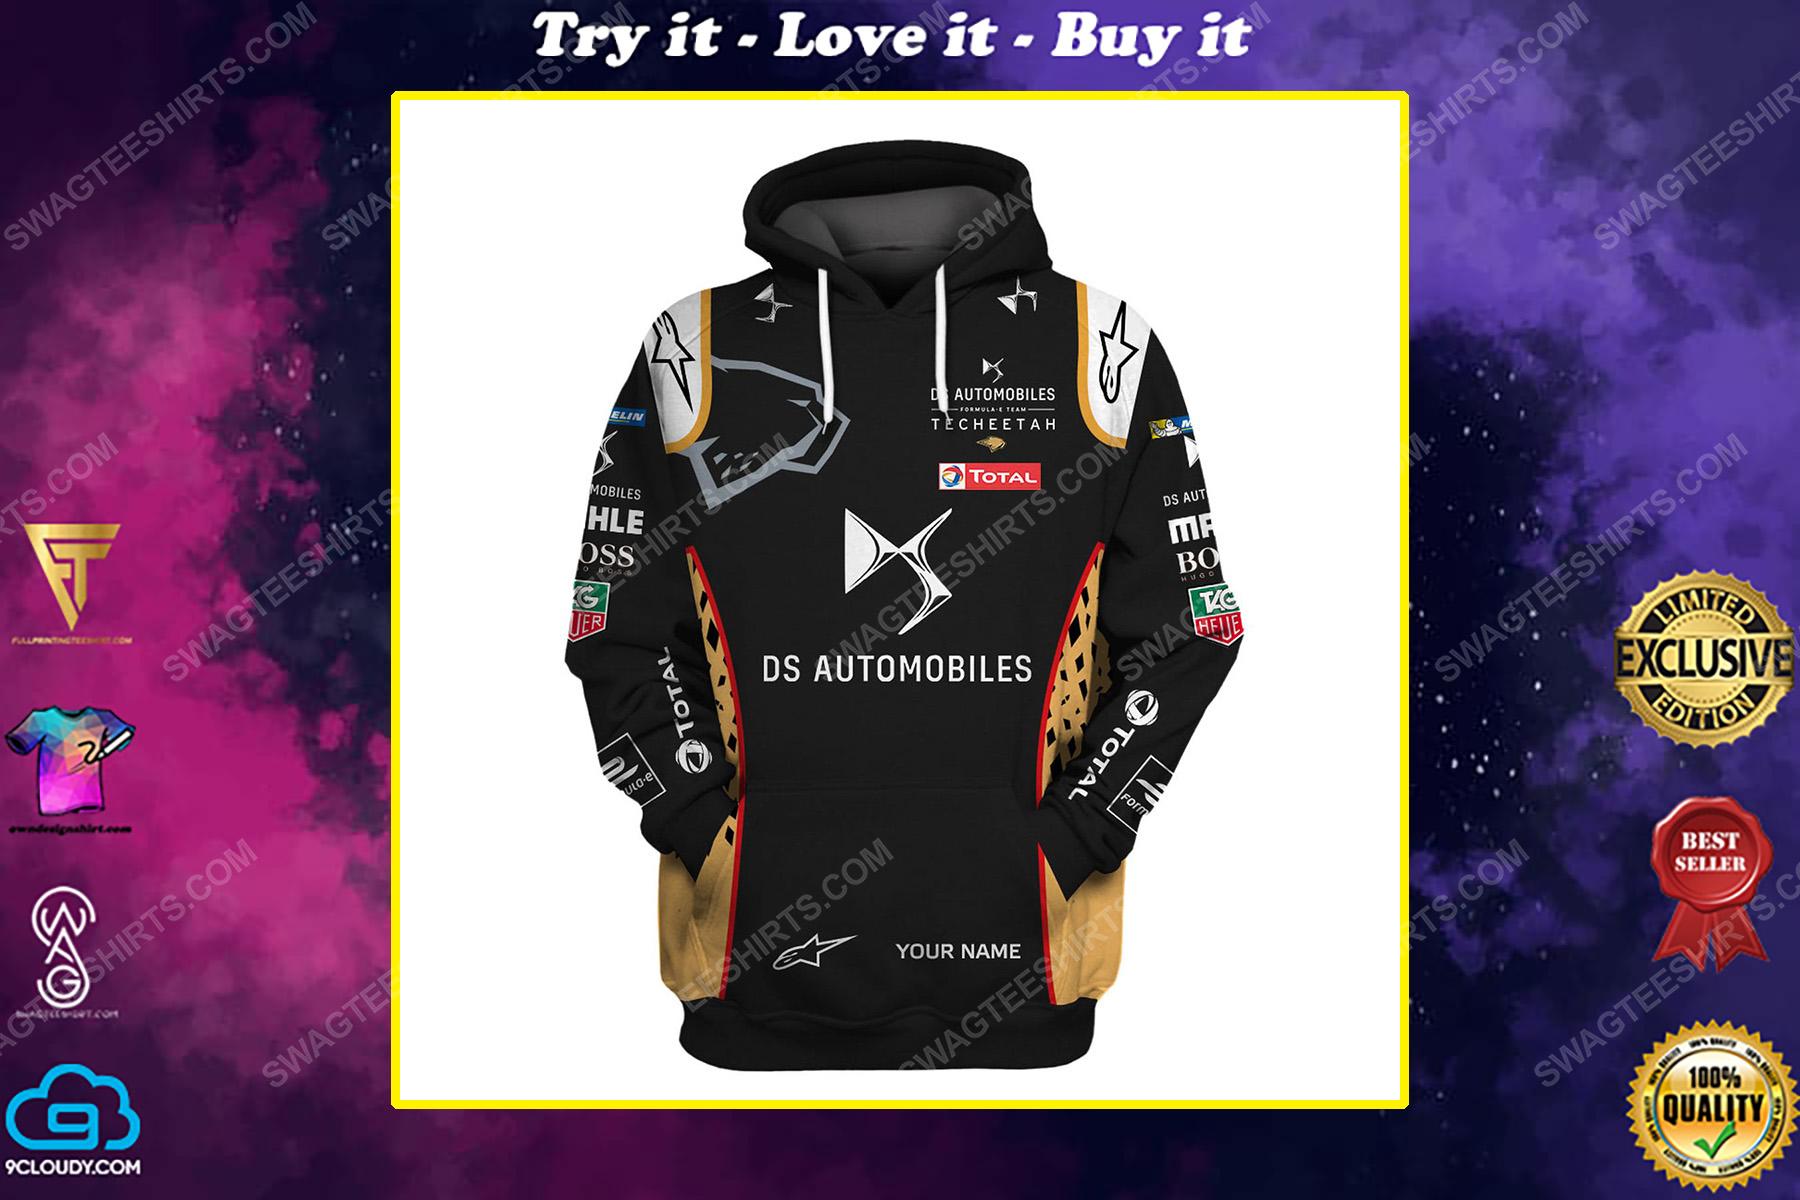 Custom ds automobiles racing team motorsport full printing shirt